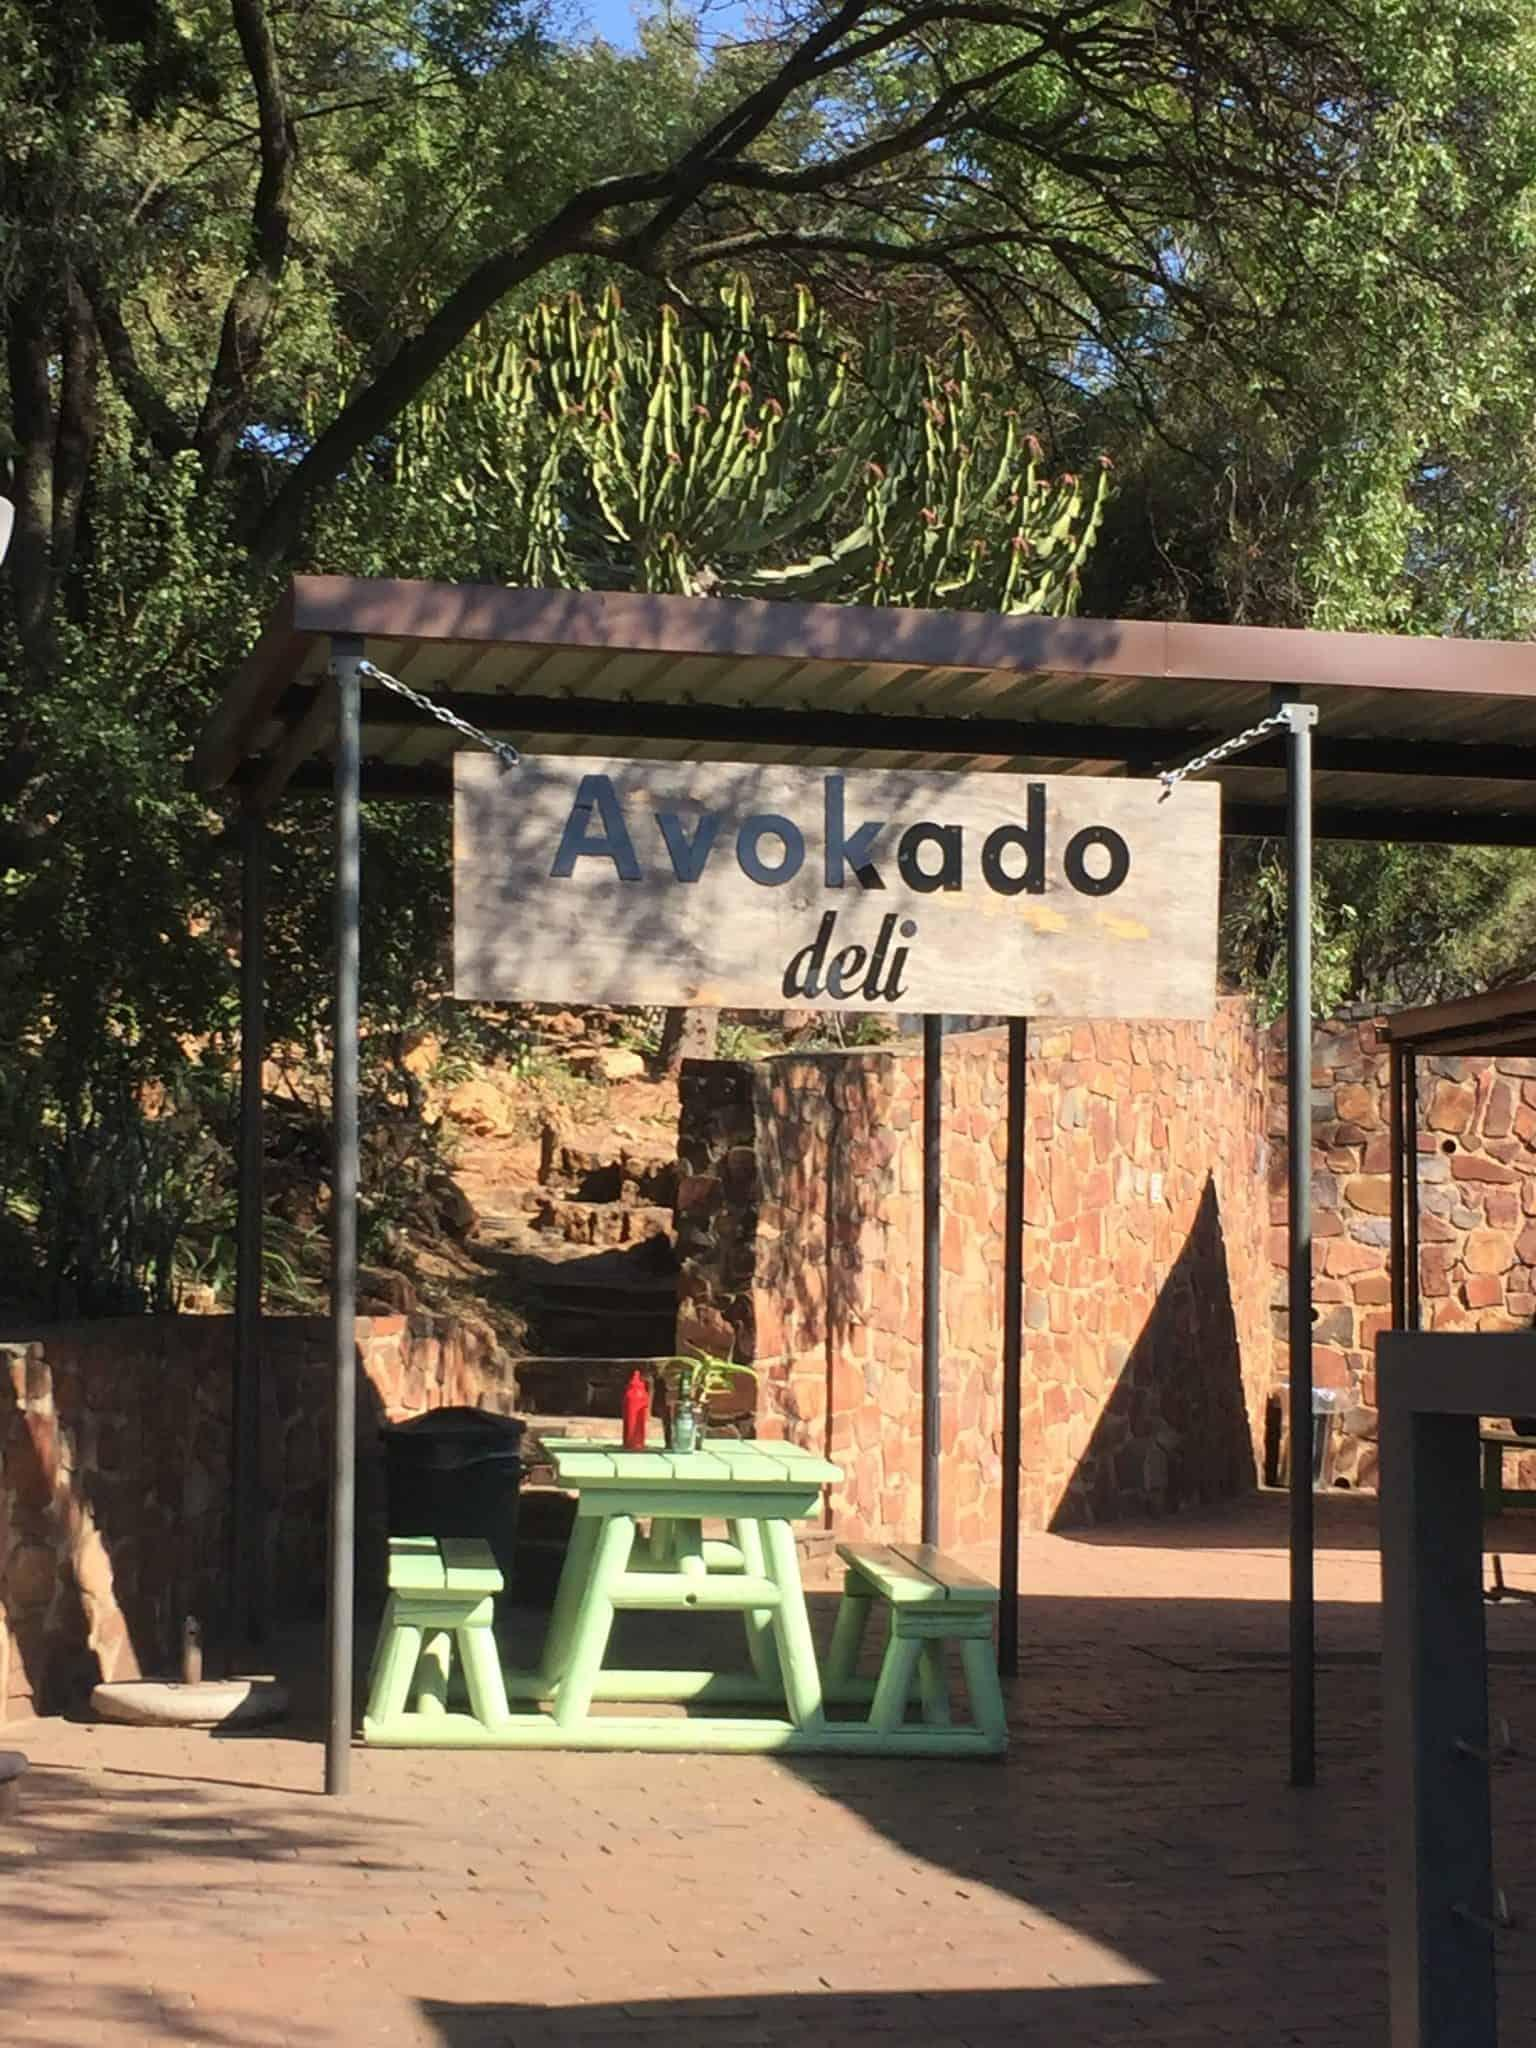 Avokado Deli, Voortrekker Monument